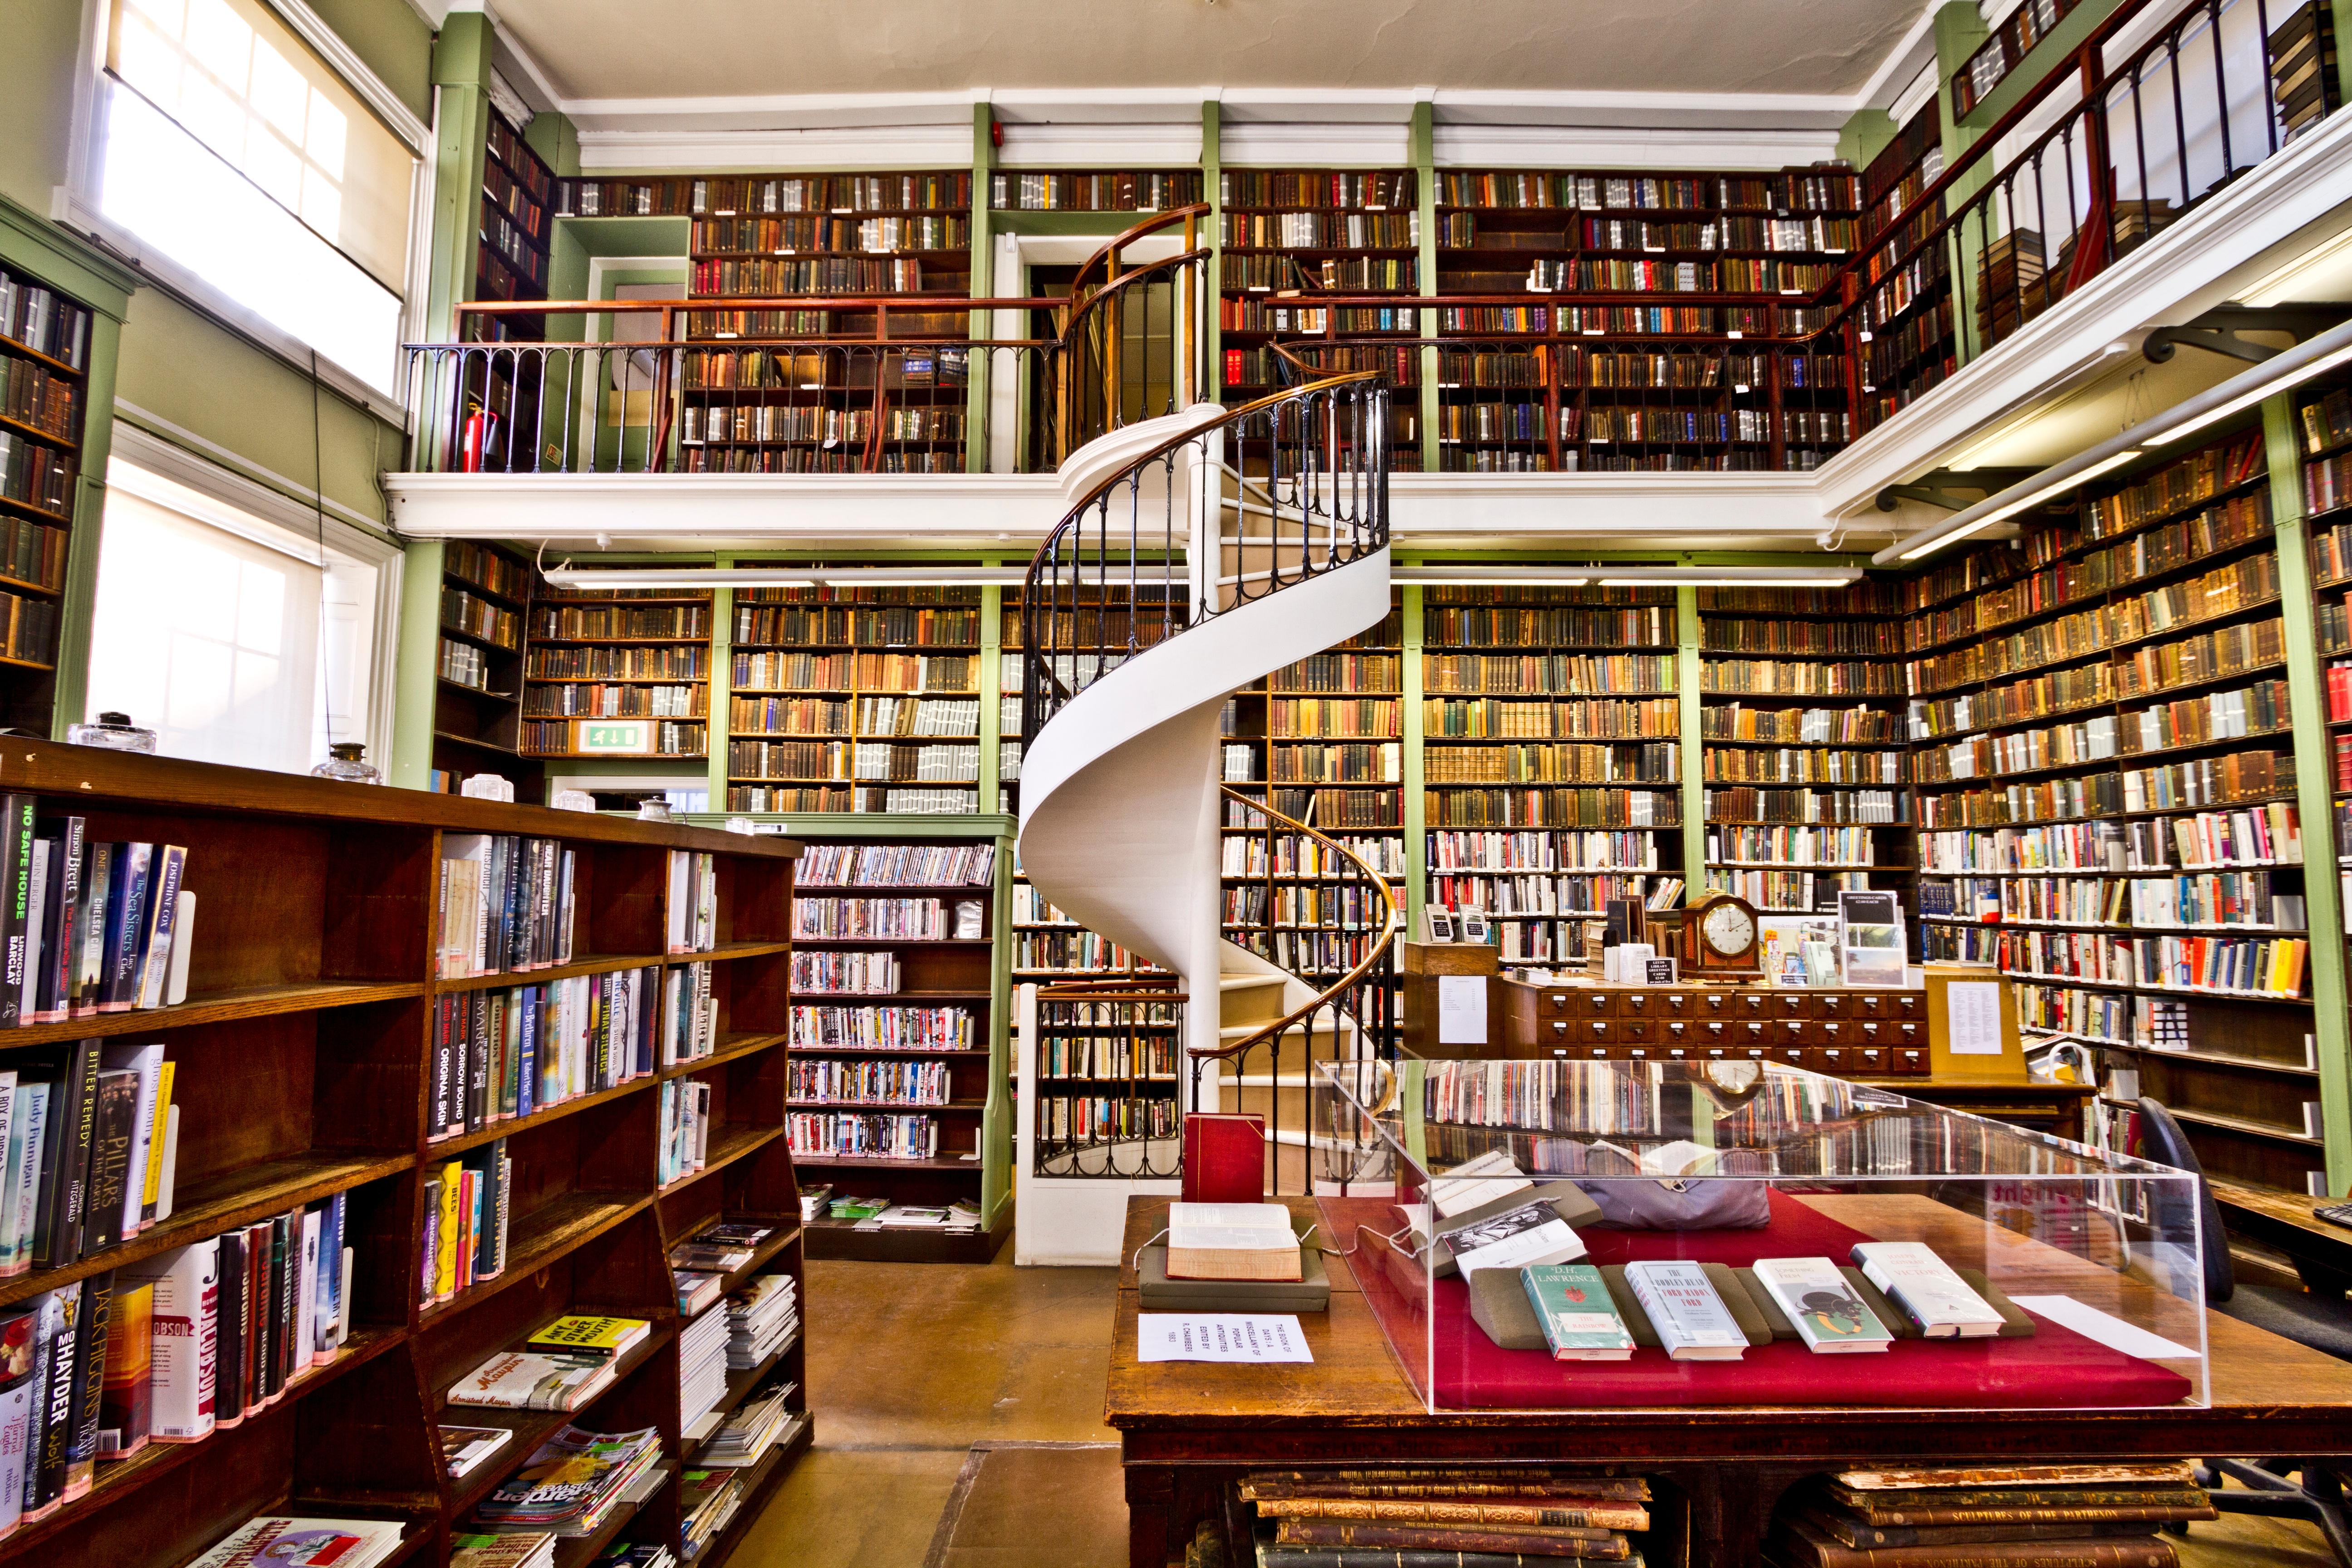 Библиотека на картинках и фотографиях страсбурга